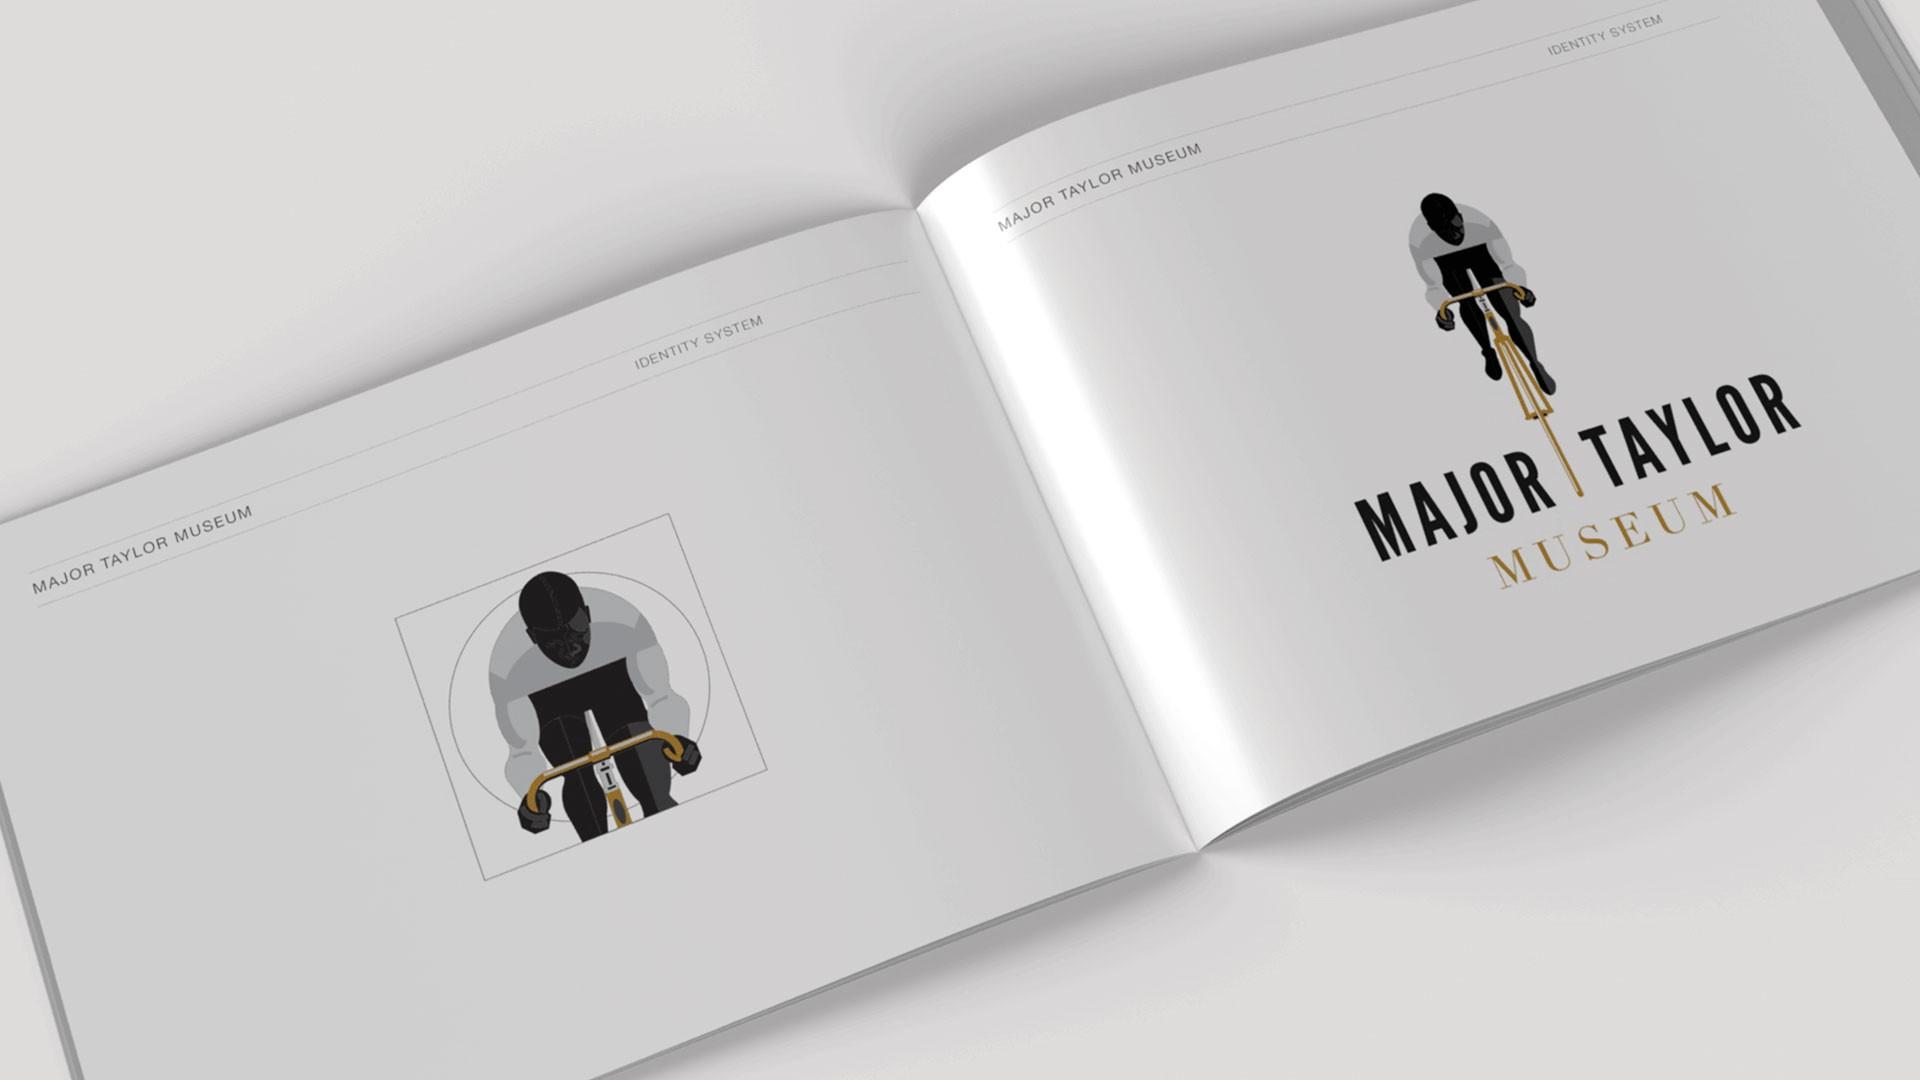 MajorTaylorMuseum